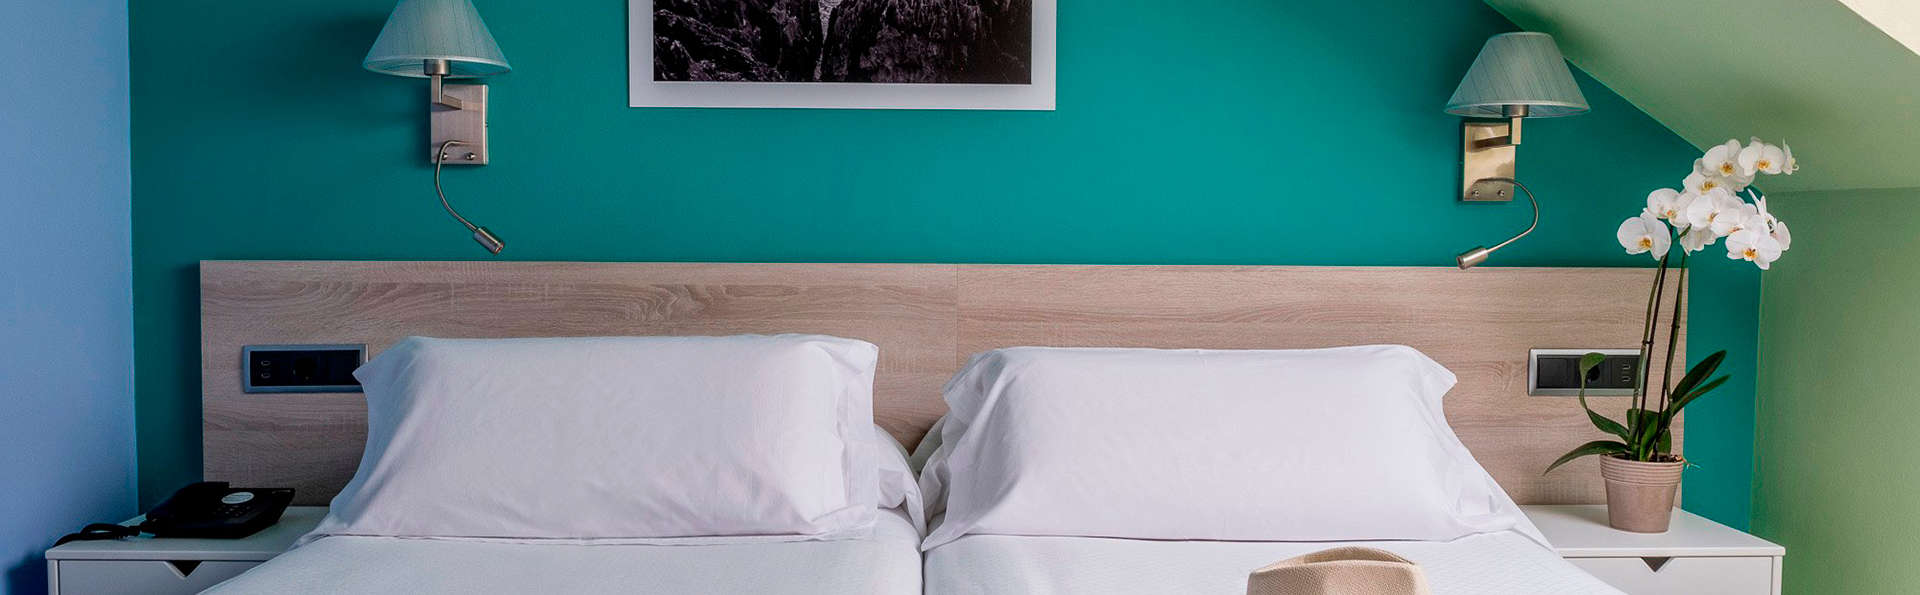 Hotel Miracielos - EDIT_room9.jpg